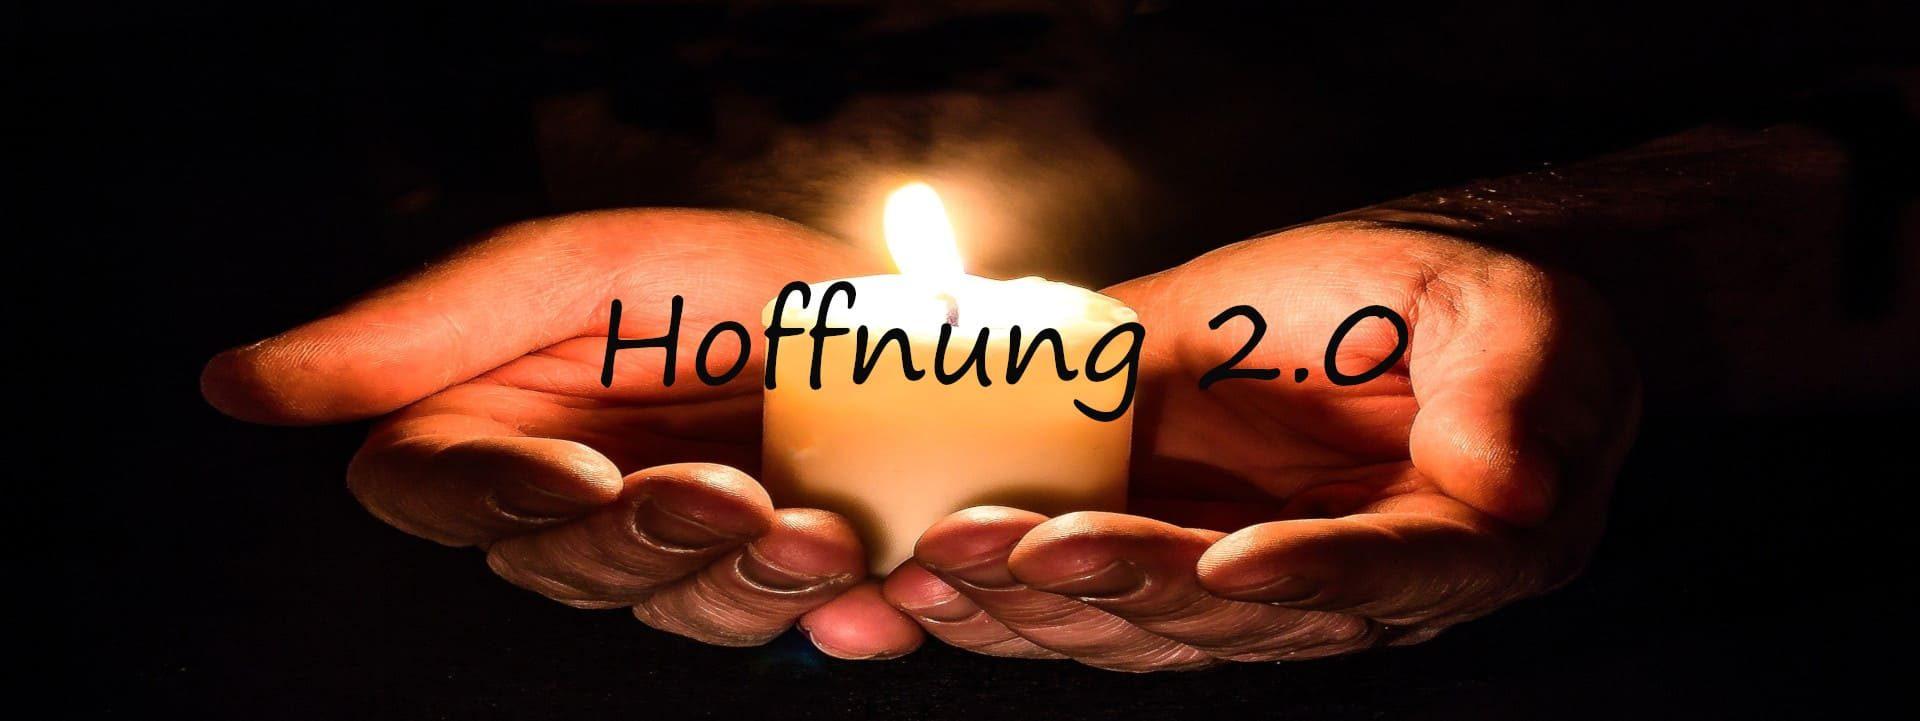 Gedichtbanner Hoffnung 2.0